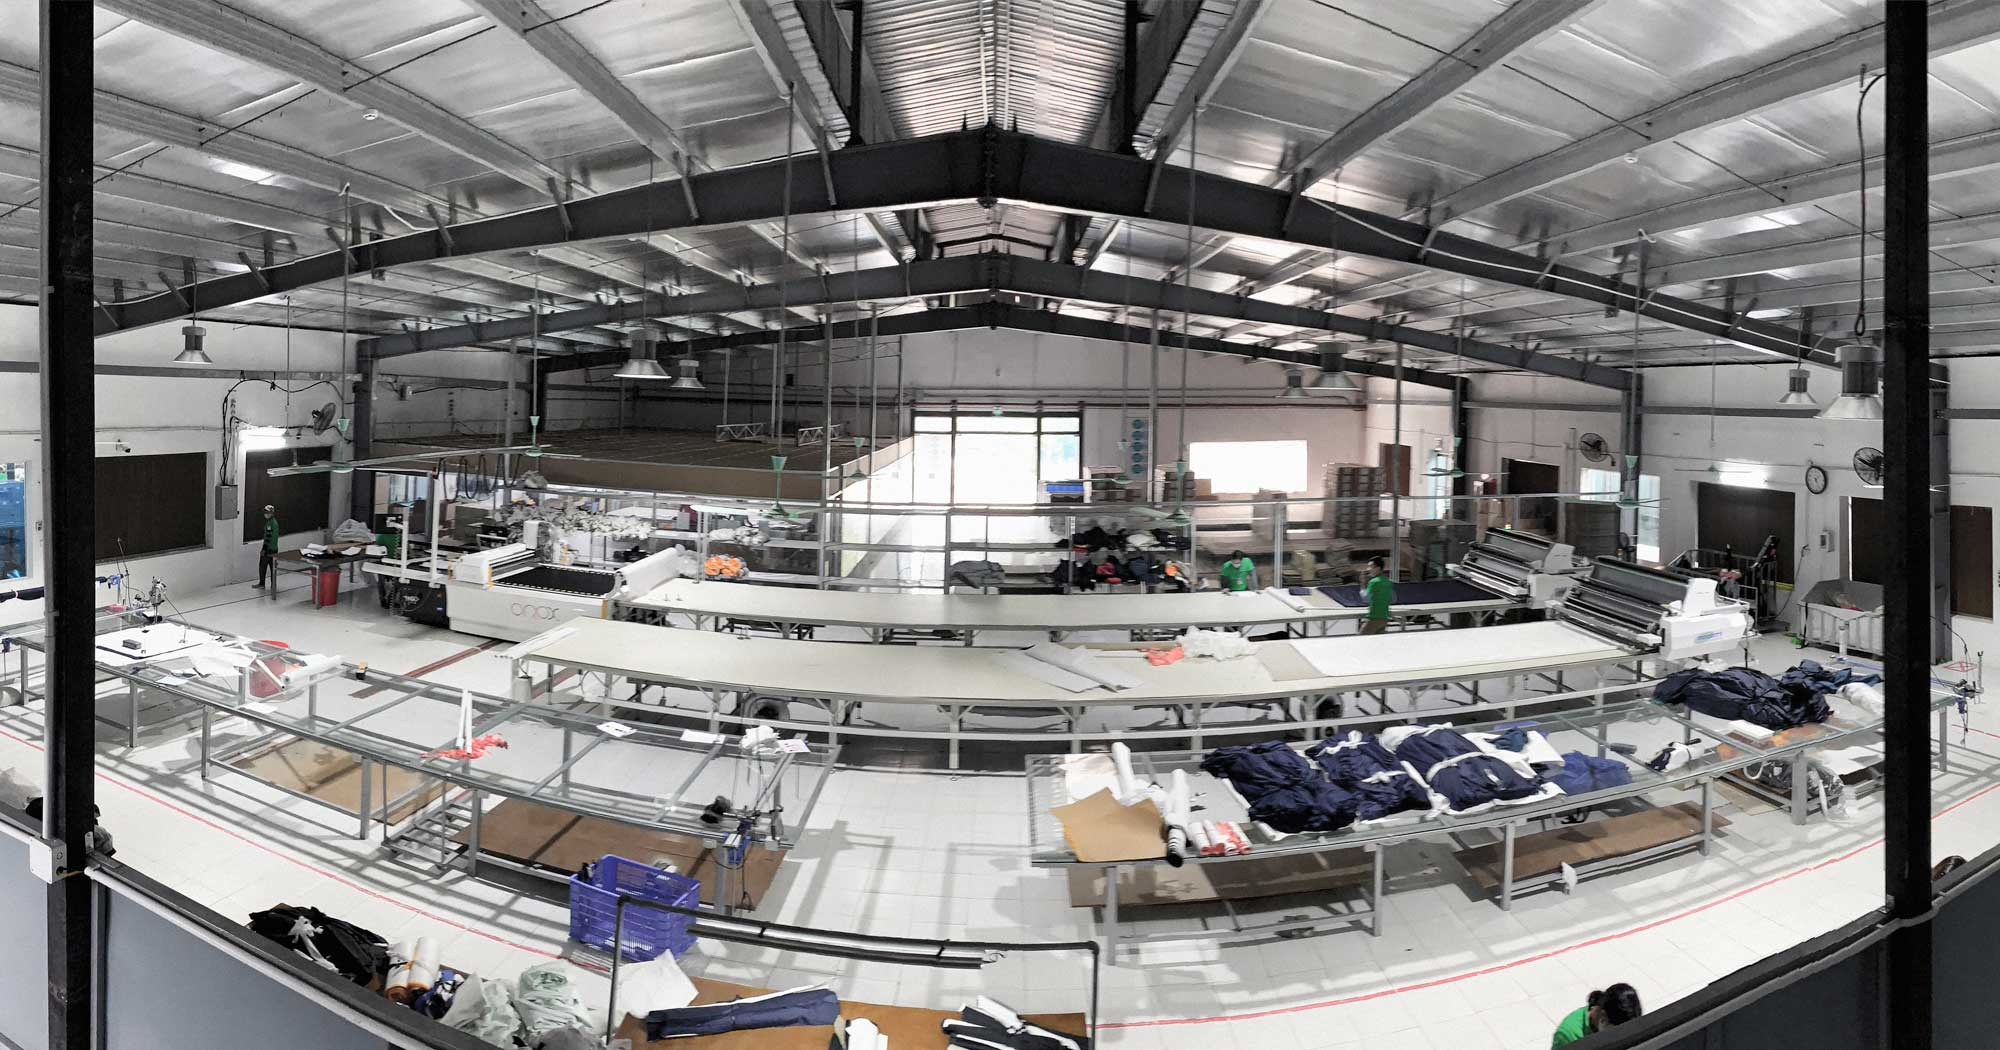 Ljung production facilities